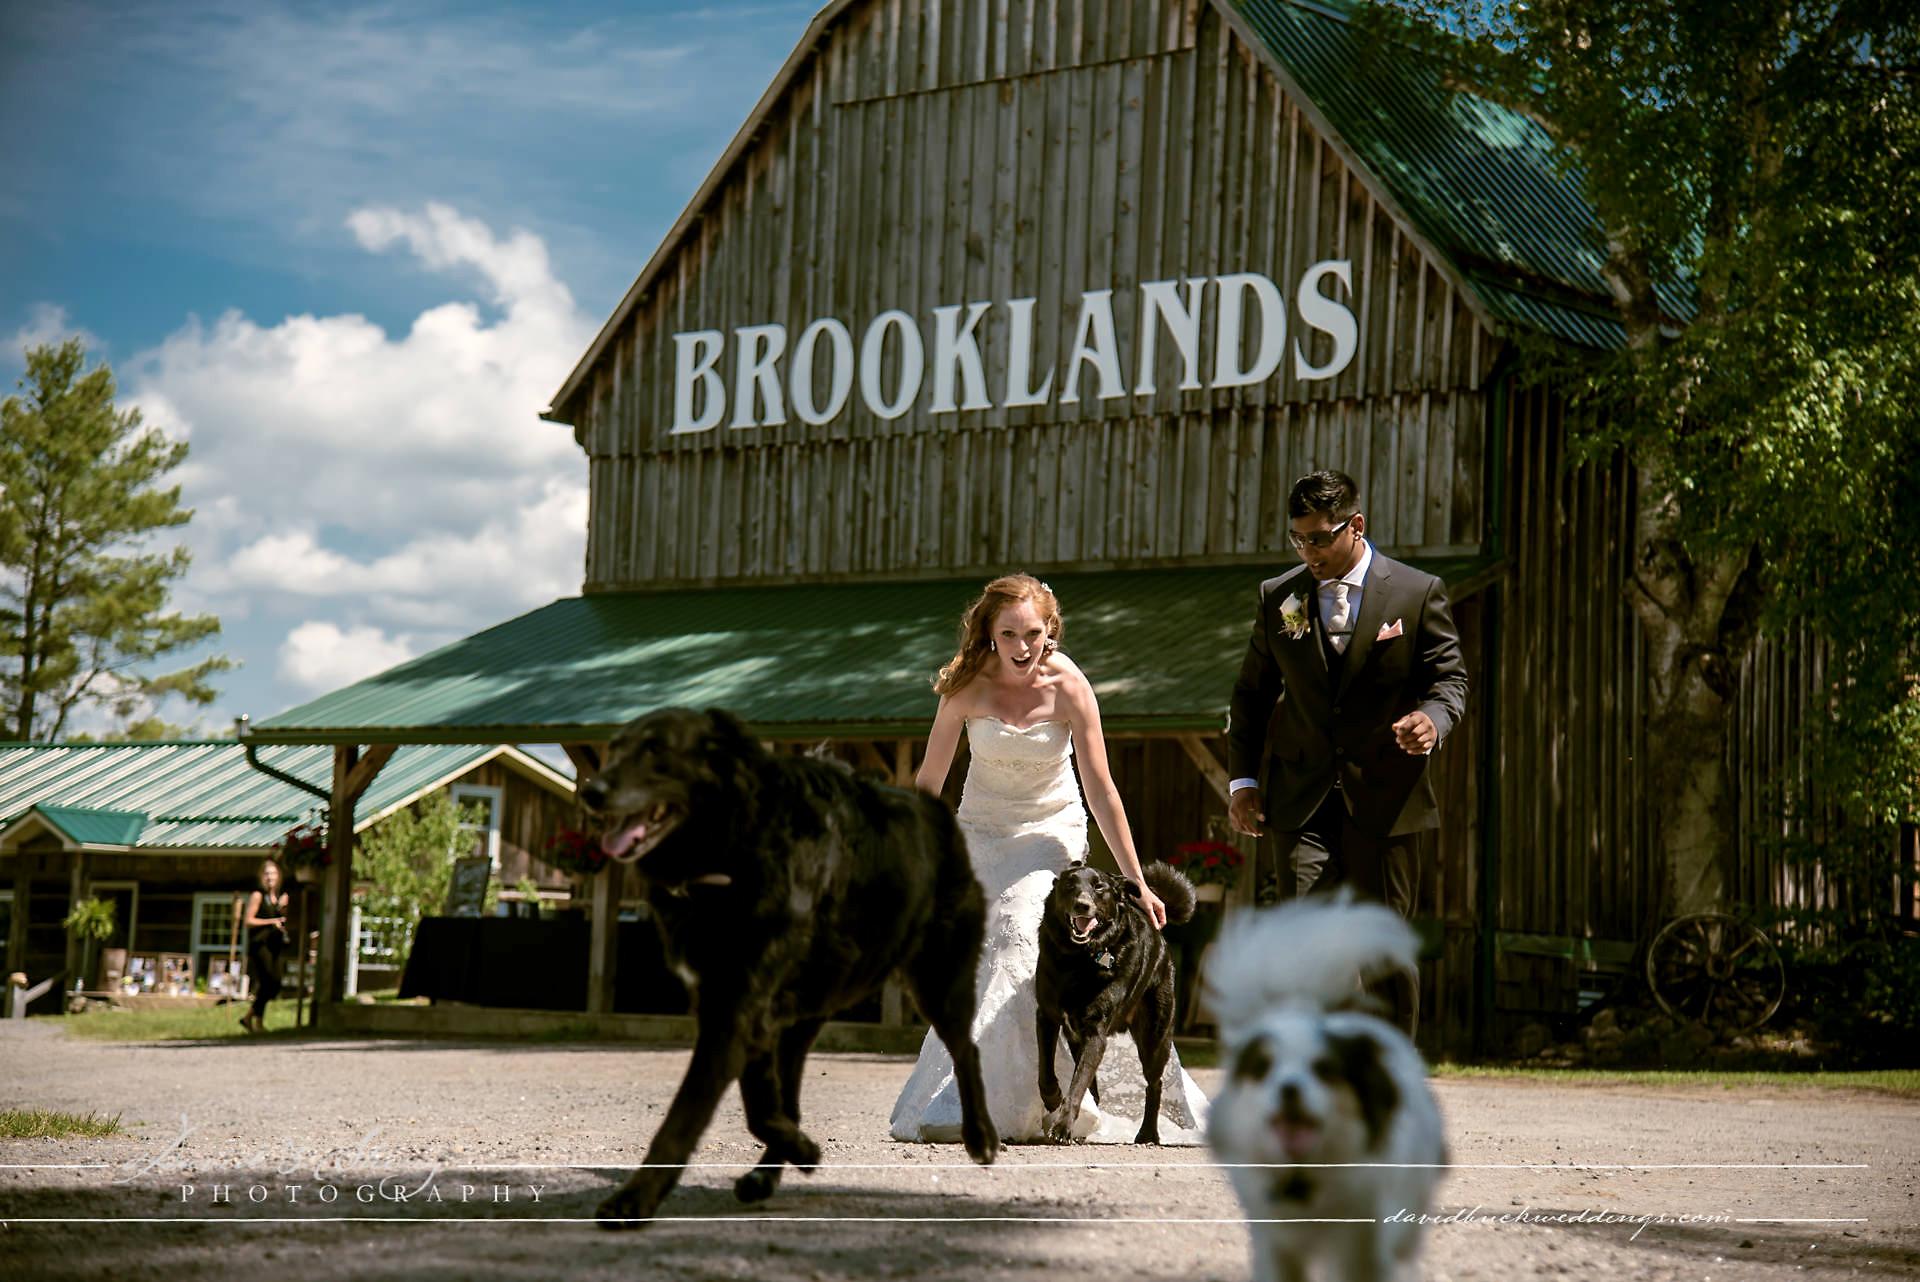 Brooklands_farm_wedding_11